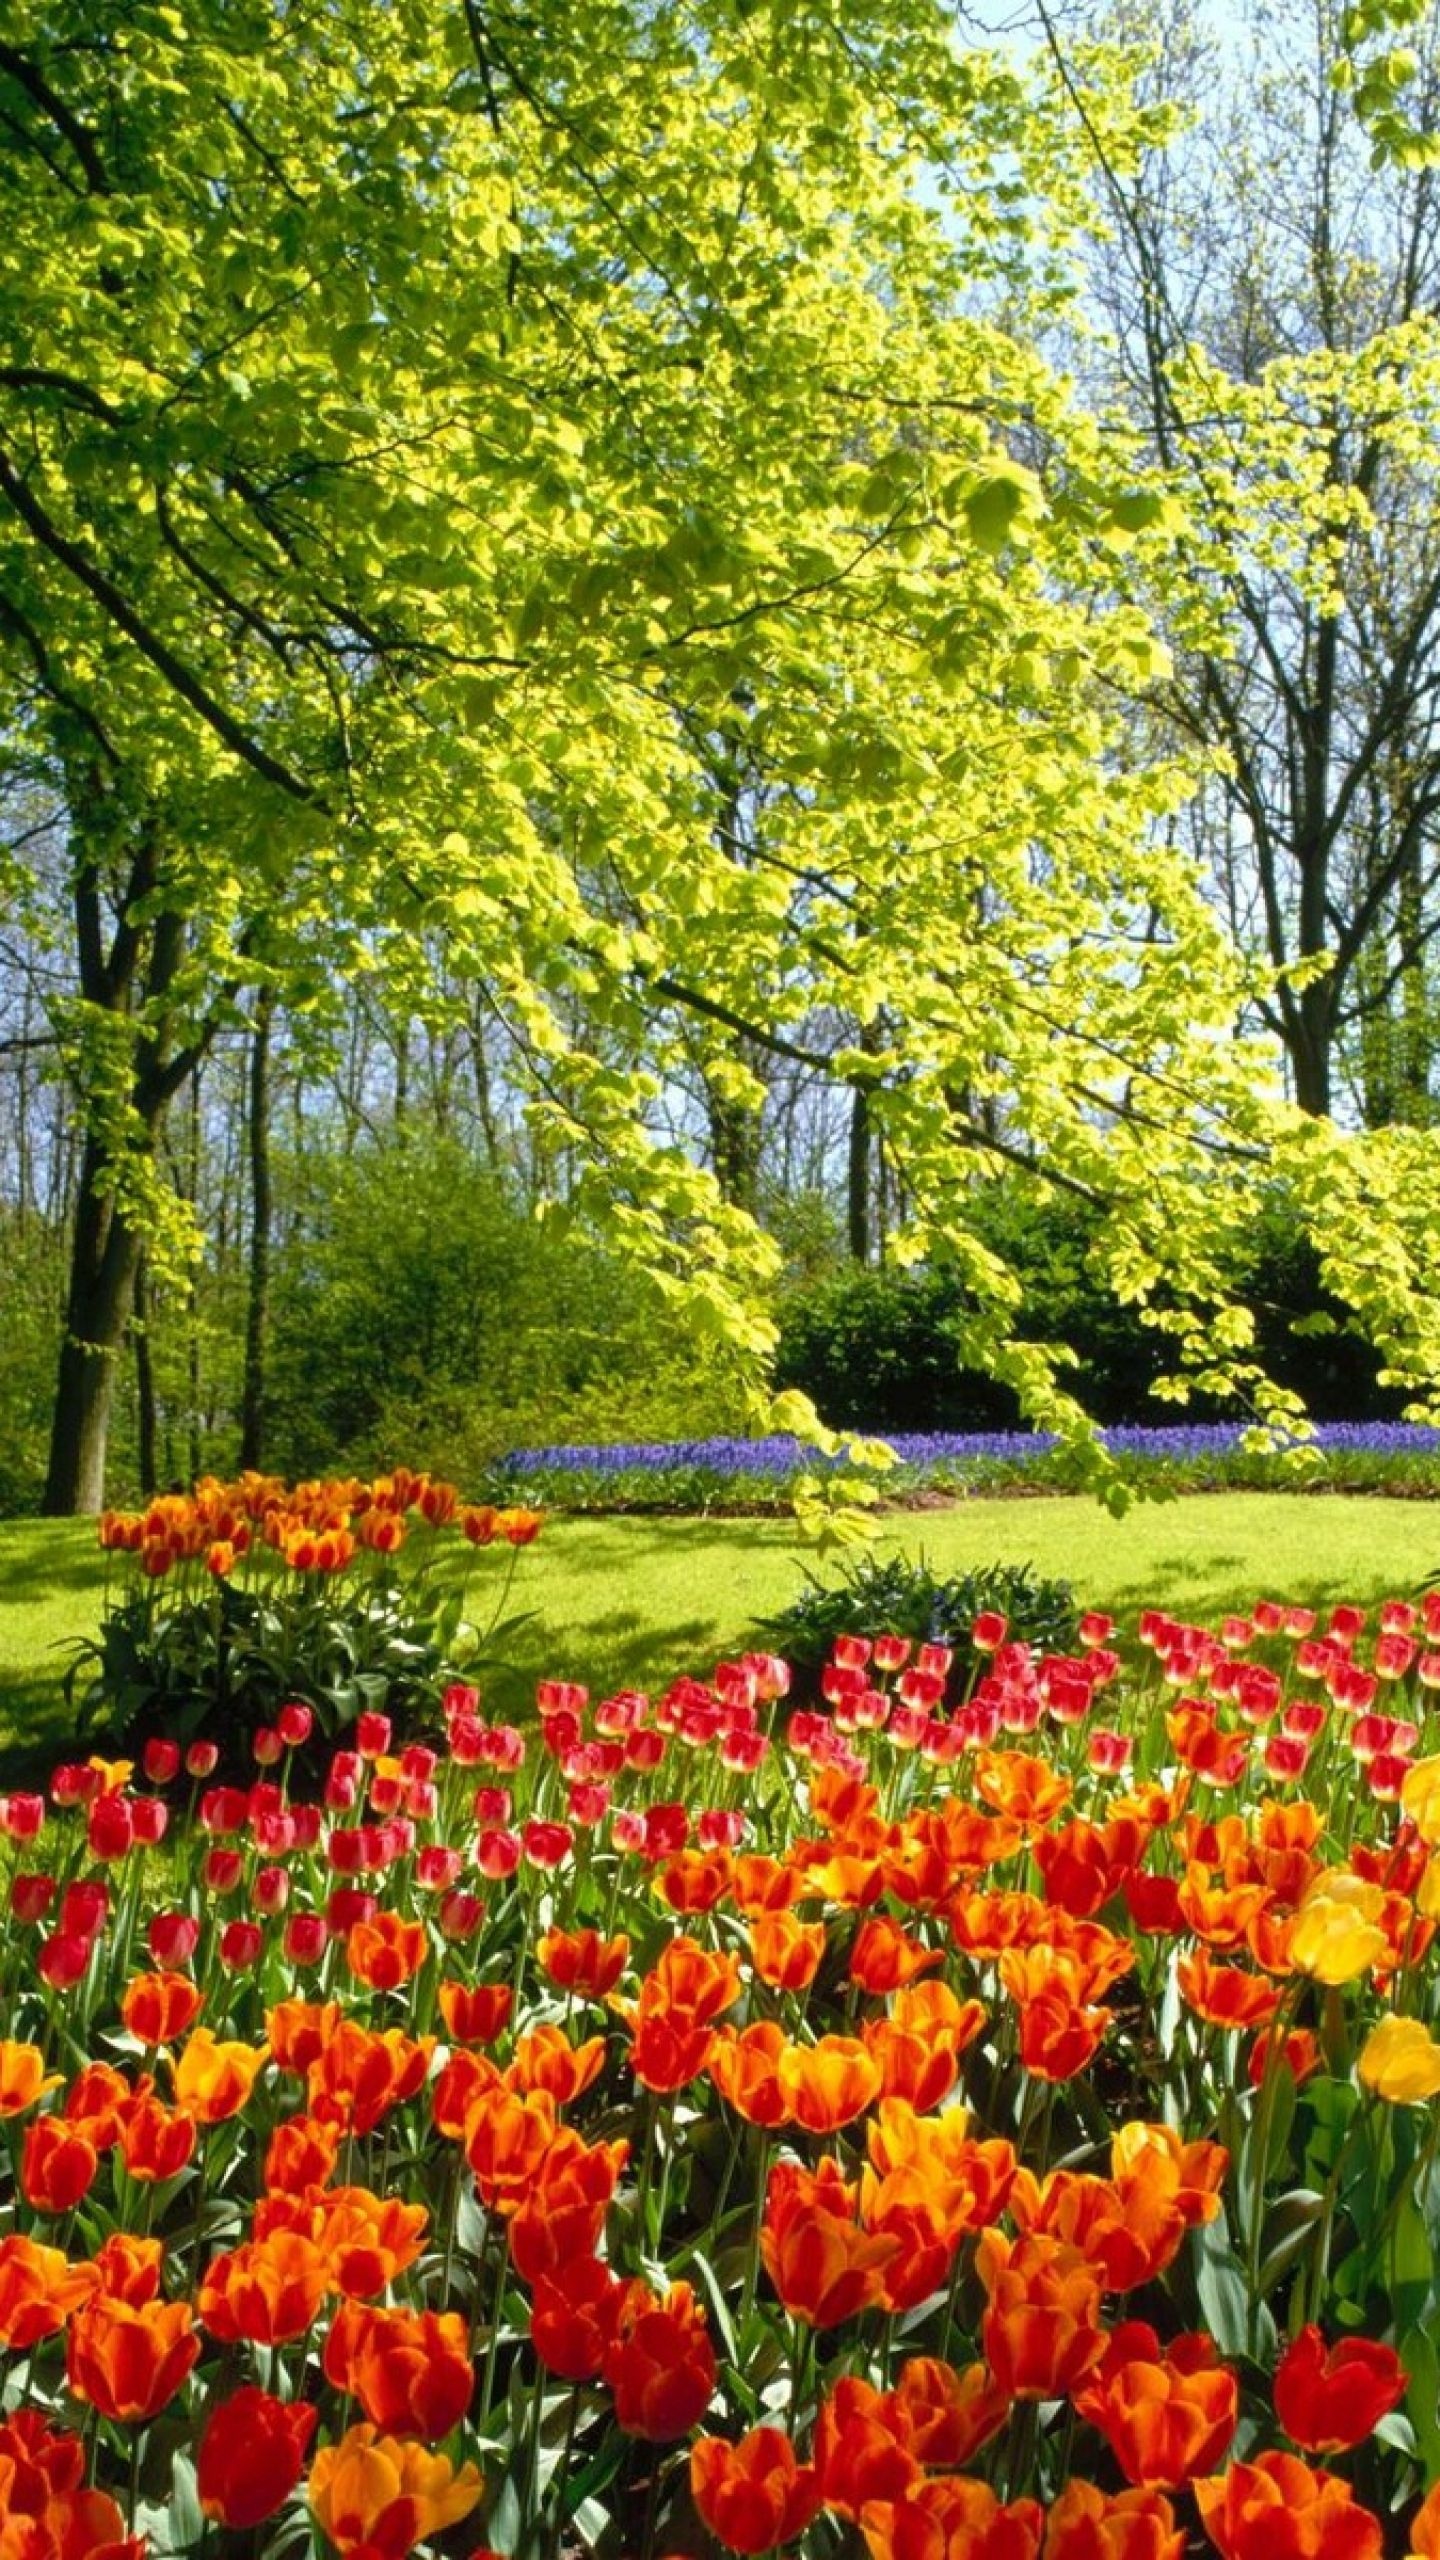 Eleletsitz Tulip Garden Wallpaper Images Beautiful Flowers Garden Beautiful Flowers Wallpapers Spring Nature